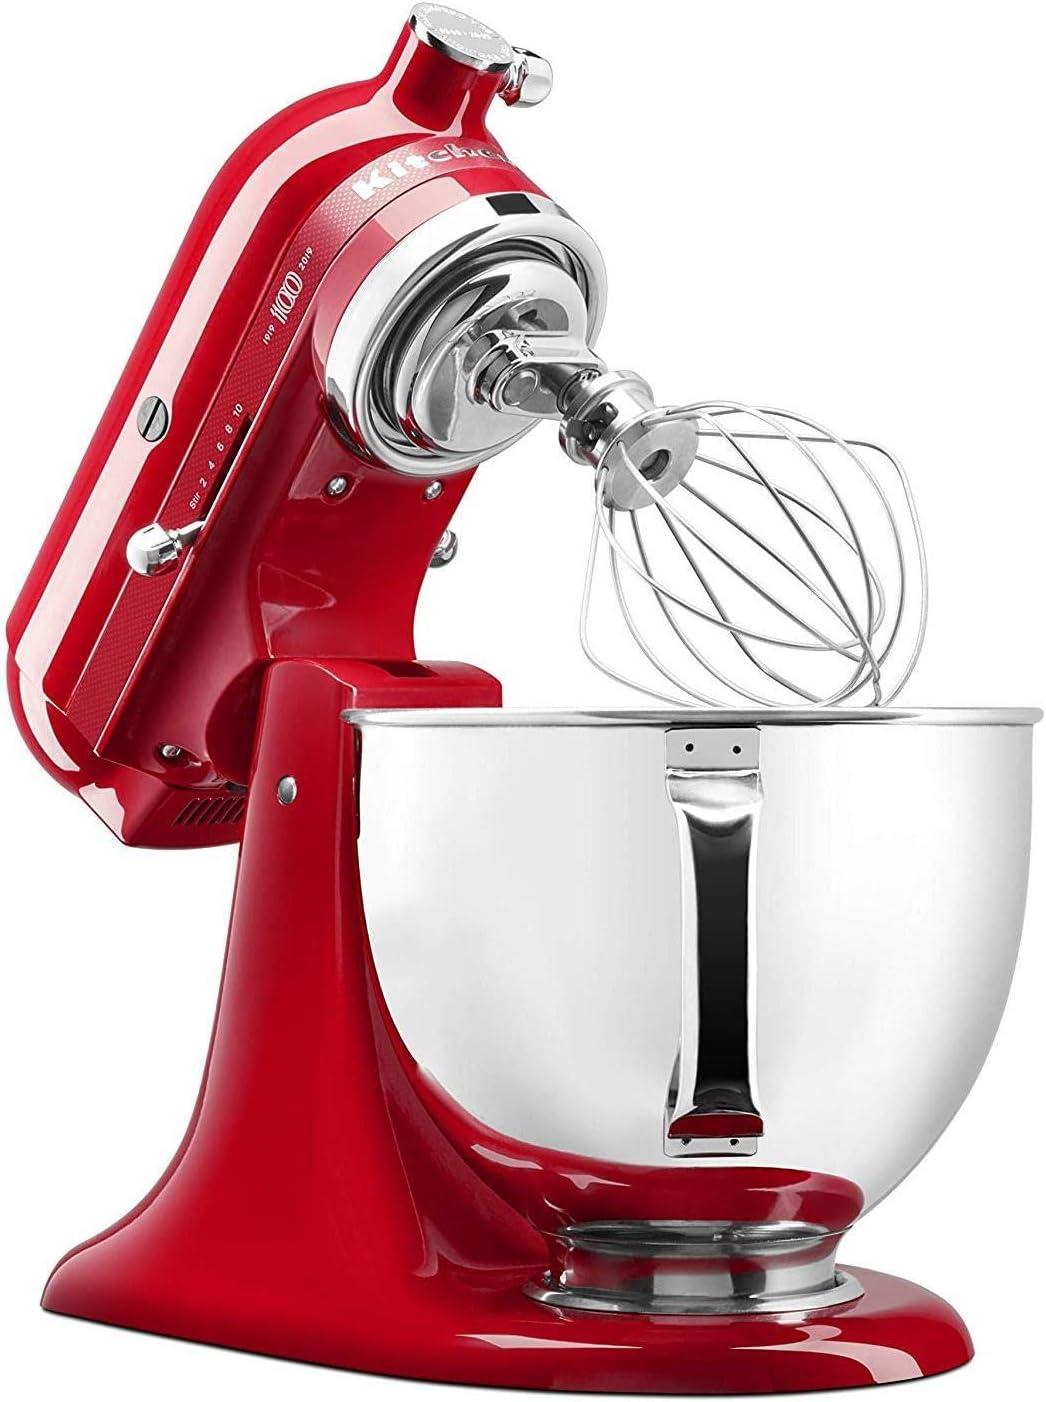 KitchenAid 5KSM180H - Robot de cocina (4,8 L, Rojo, palanca, 1,45 m, China, Acero inoxidable): Amazon.es: Hogar